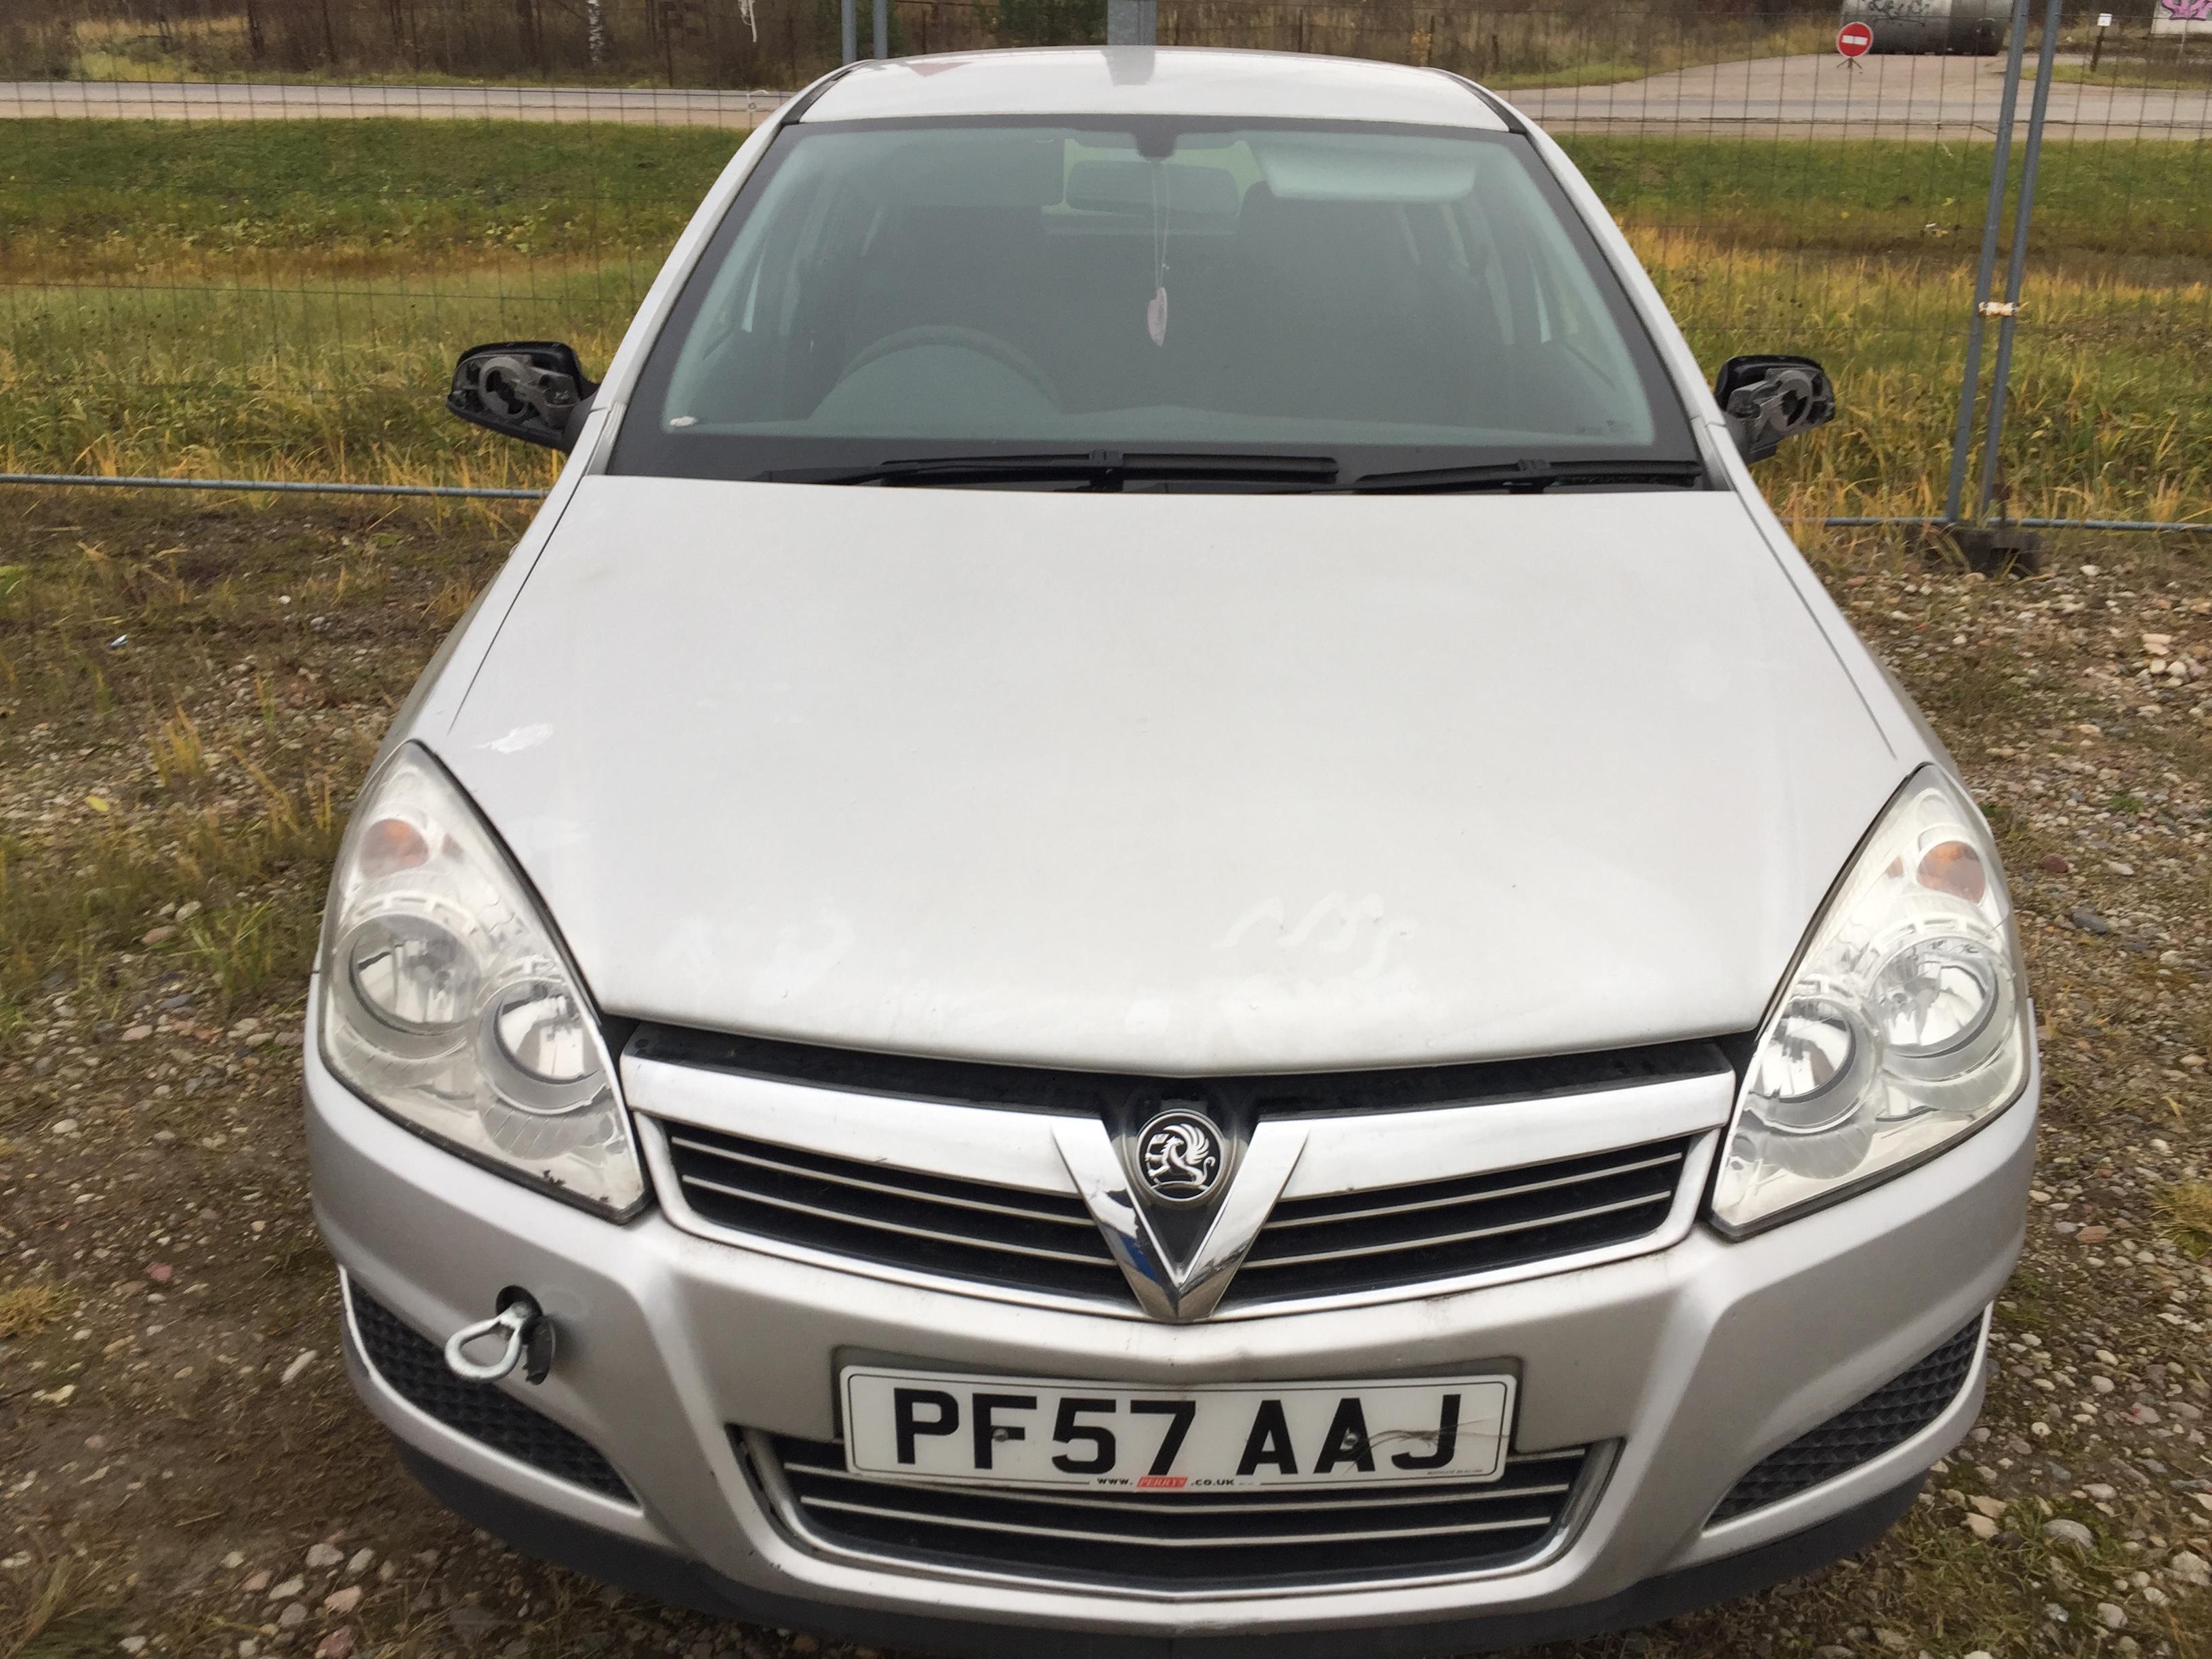 13222872 Zuh 339 Fuse Box Opel Astra 2007 16l 20eur Eis00377384 1 6 Foto 2 H 200403 200912 Petrol 16